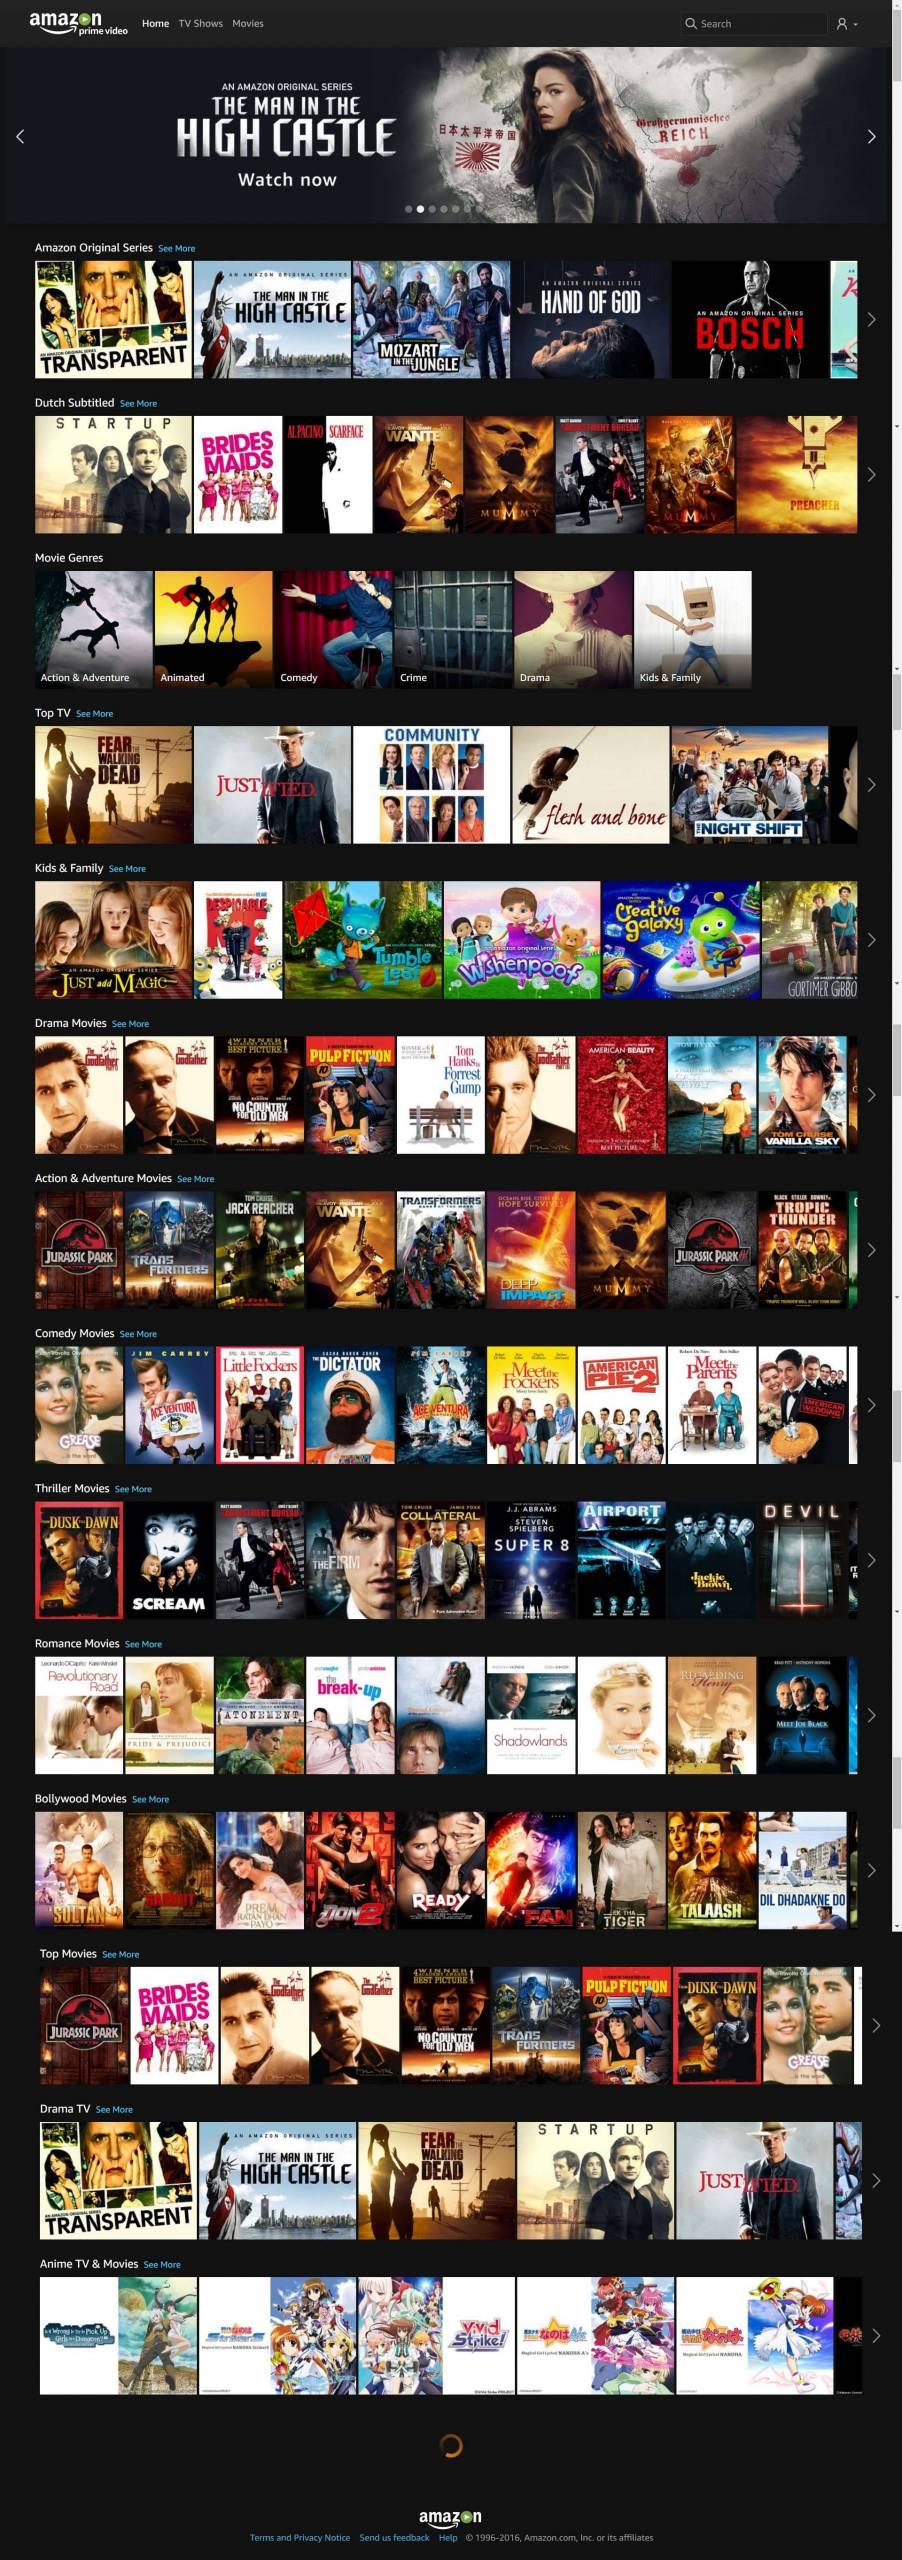 Amazon Prime Video Nederland website